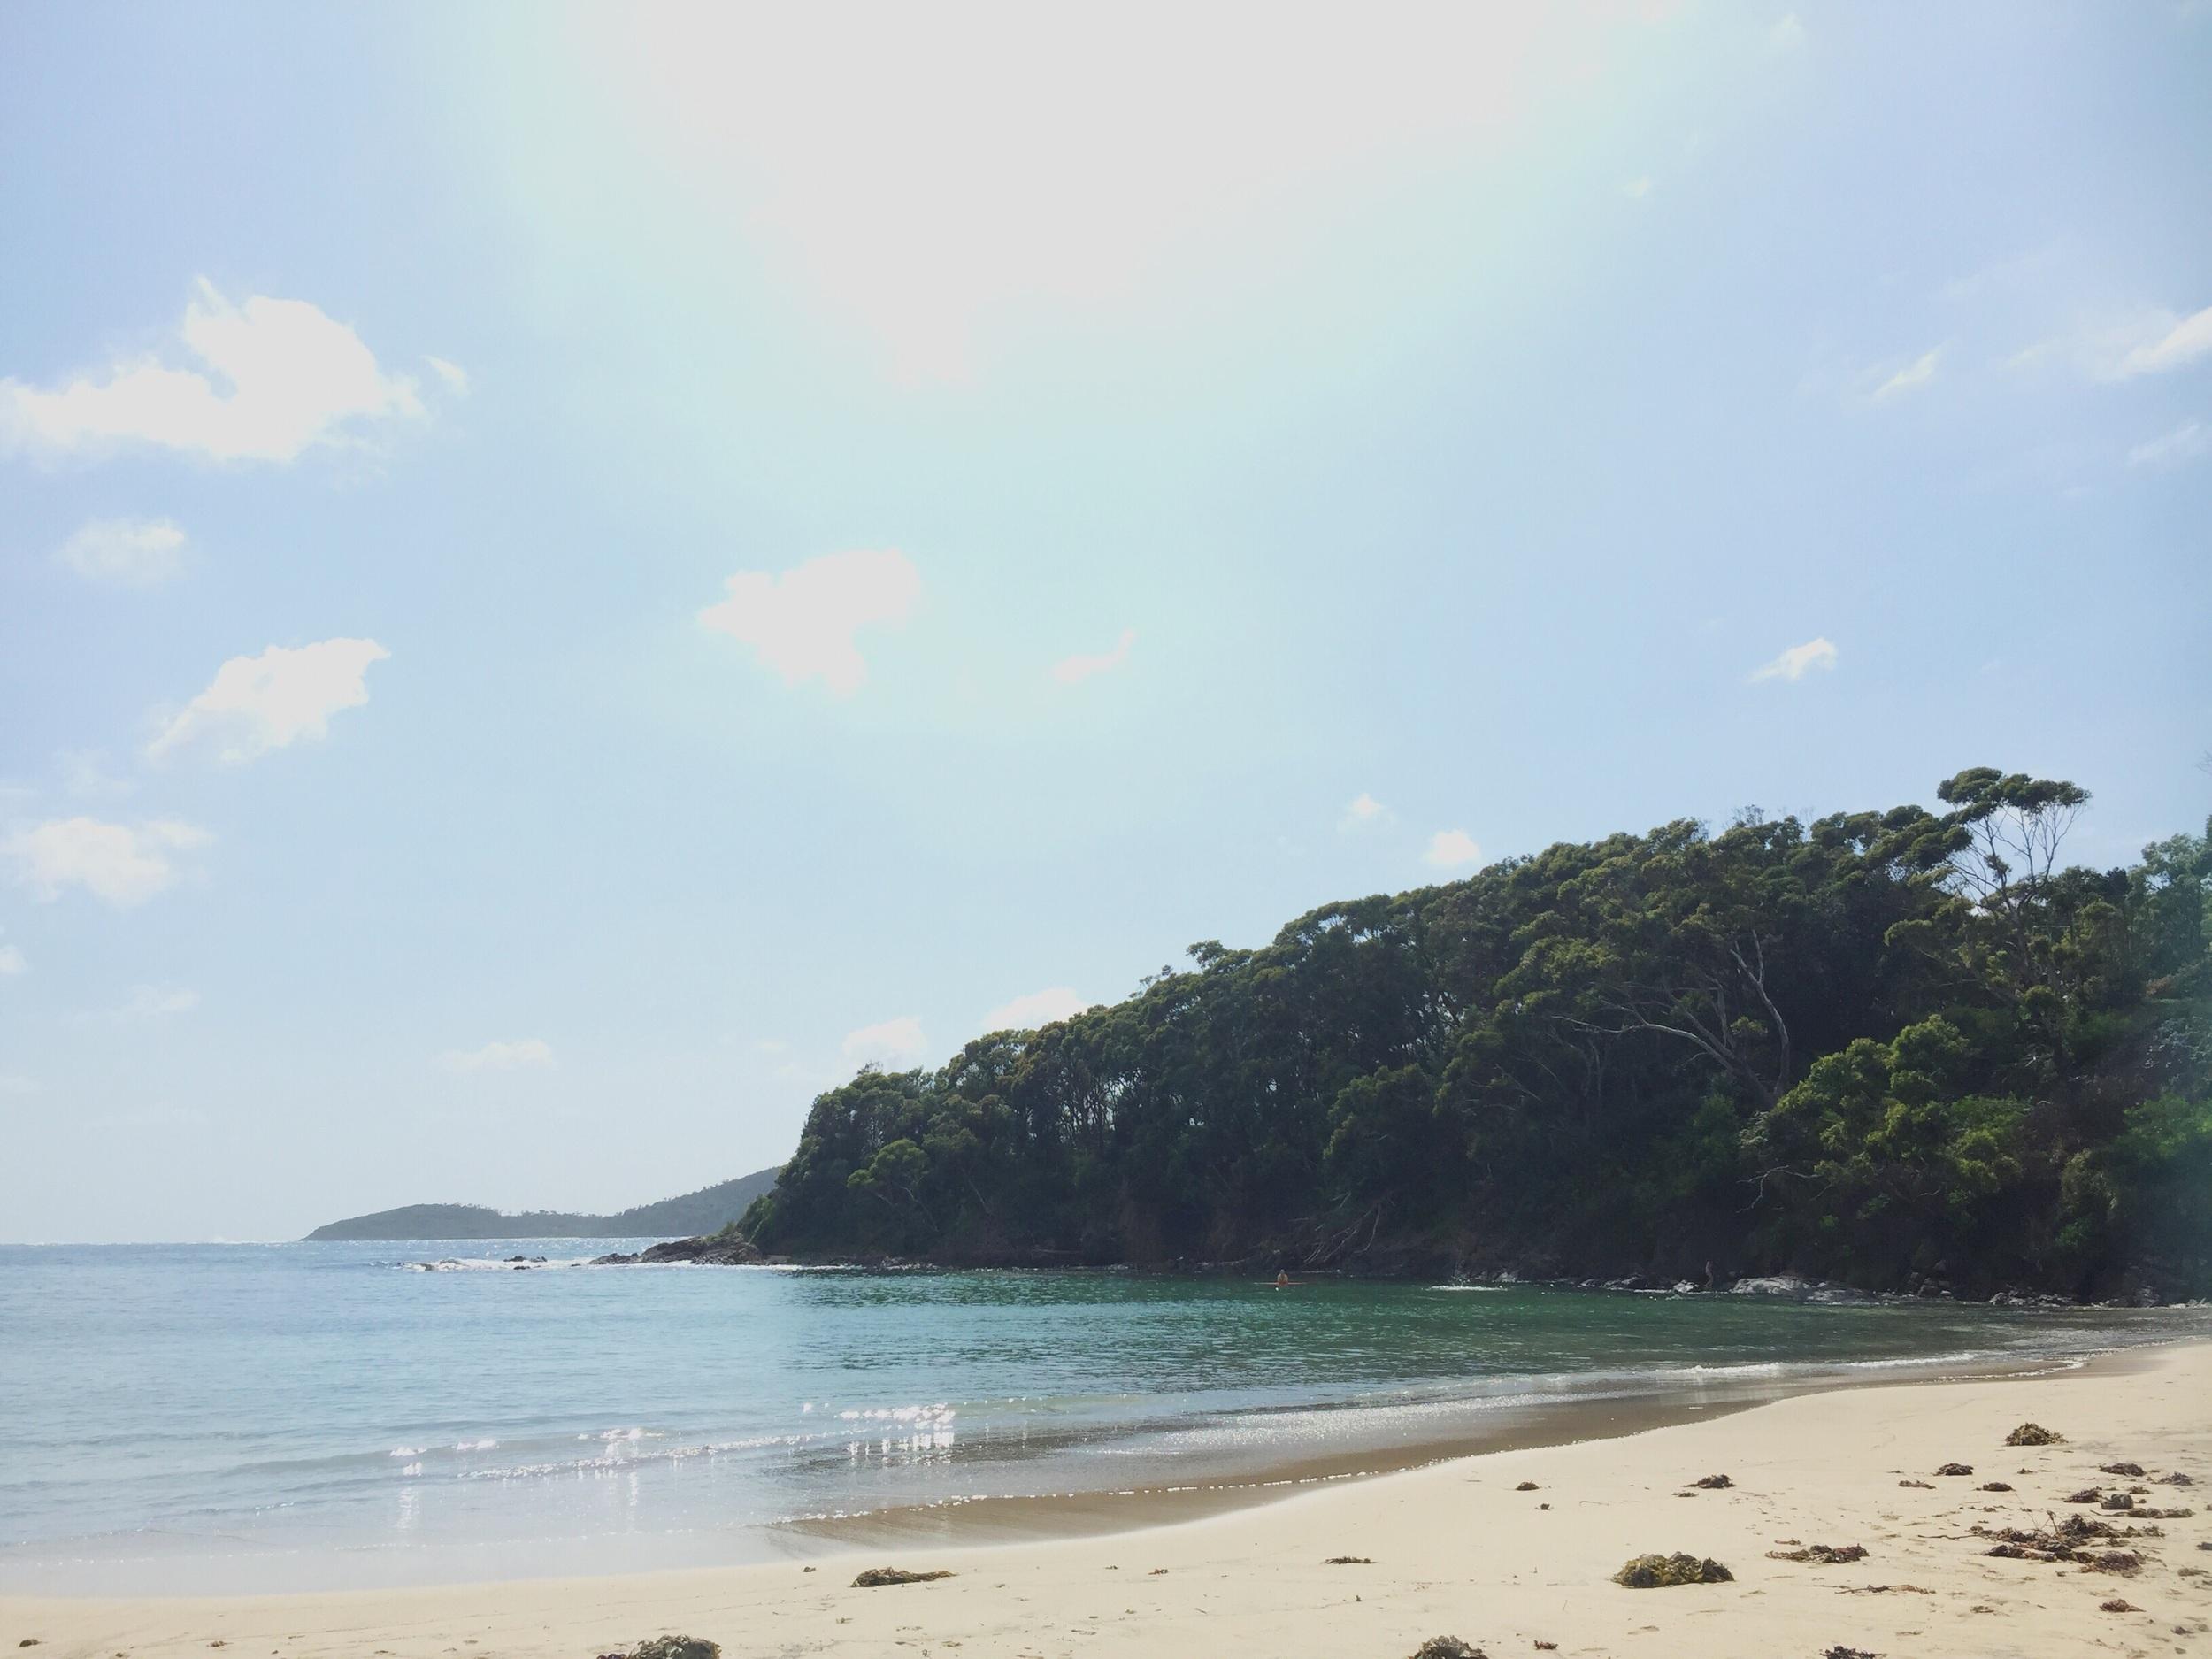 Calm waters at Fingal Bay beach